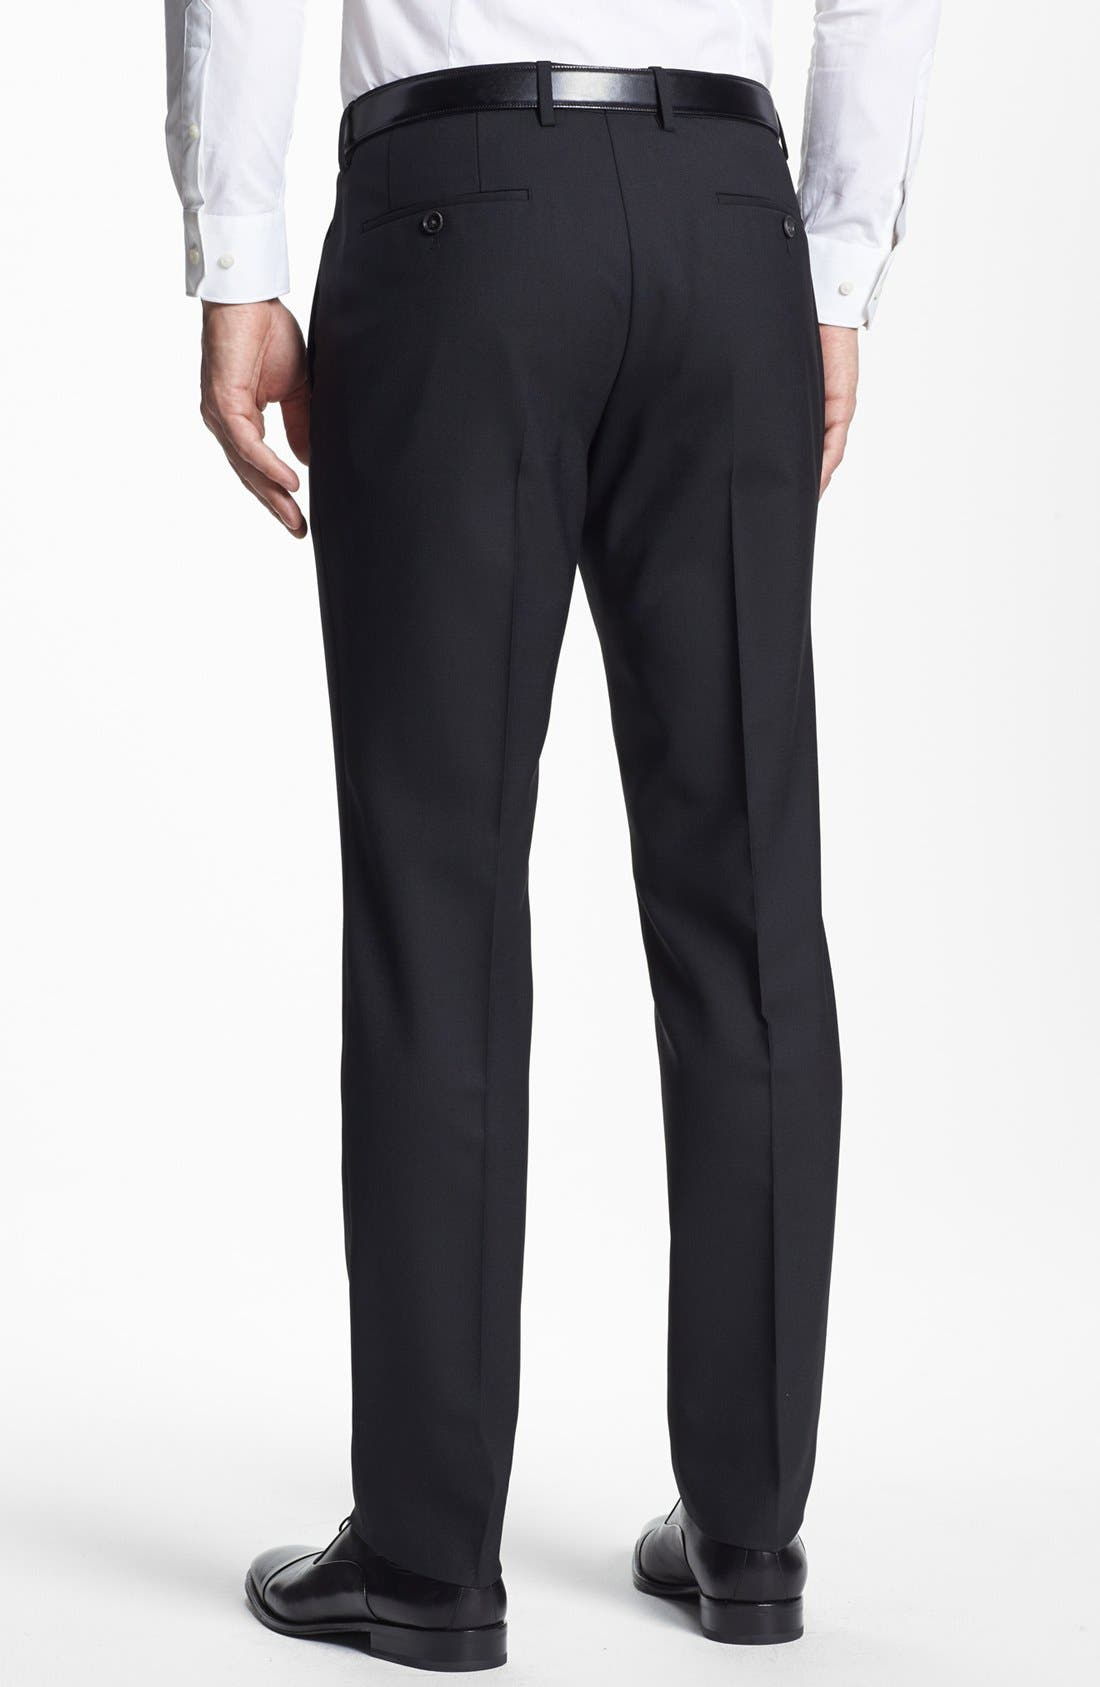 BOSS HUGO BOSS 'Genesis' Flat Front Trousers,                             Alternate thumbnail 3, color,                             001